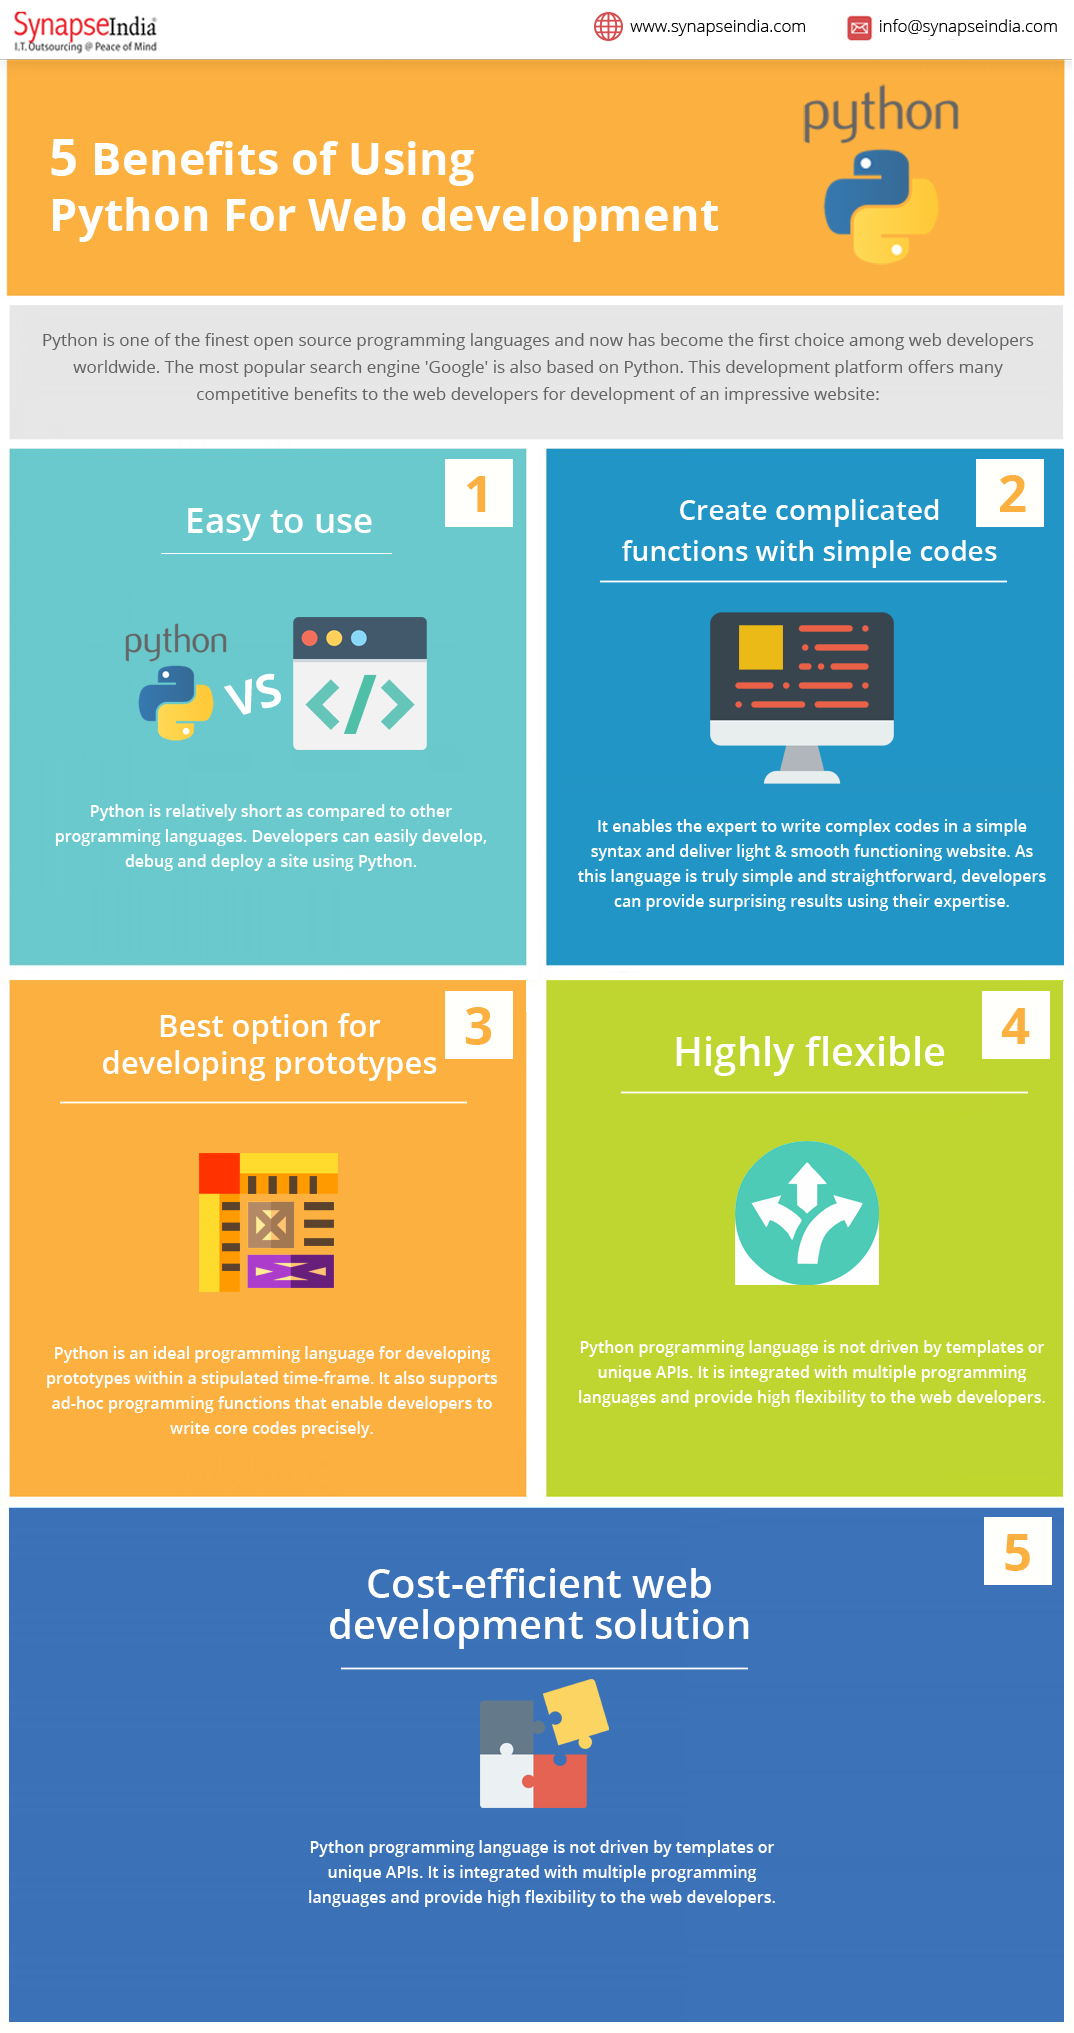 Tips And Tricks To Great Website Design Web Design Tips Web Design Infographic Responsive Web Design Web Development Design